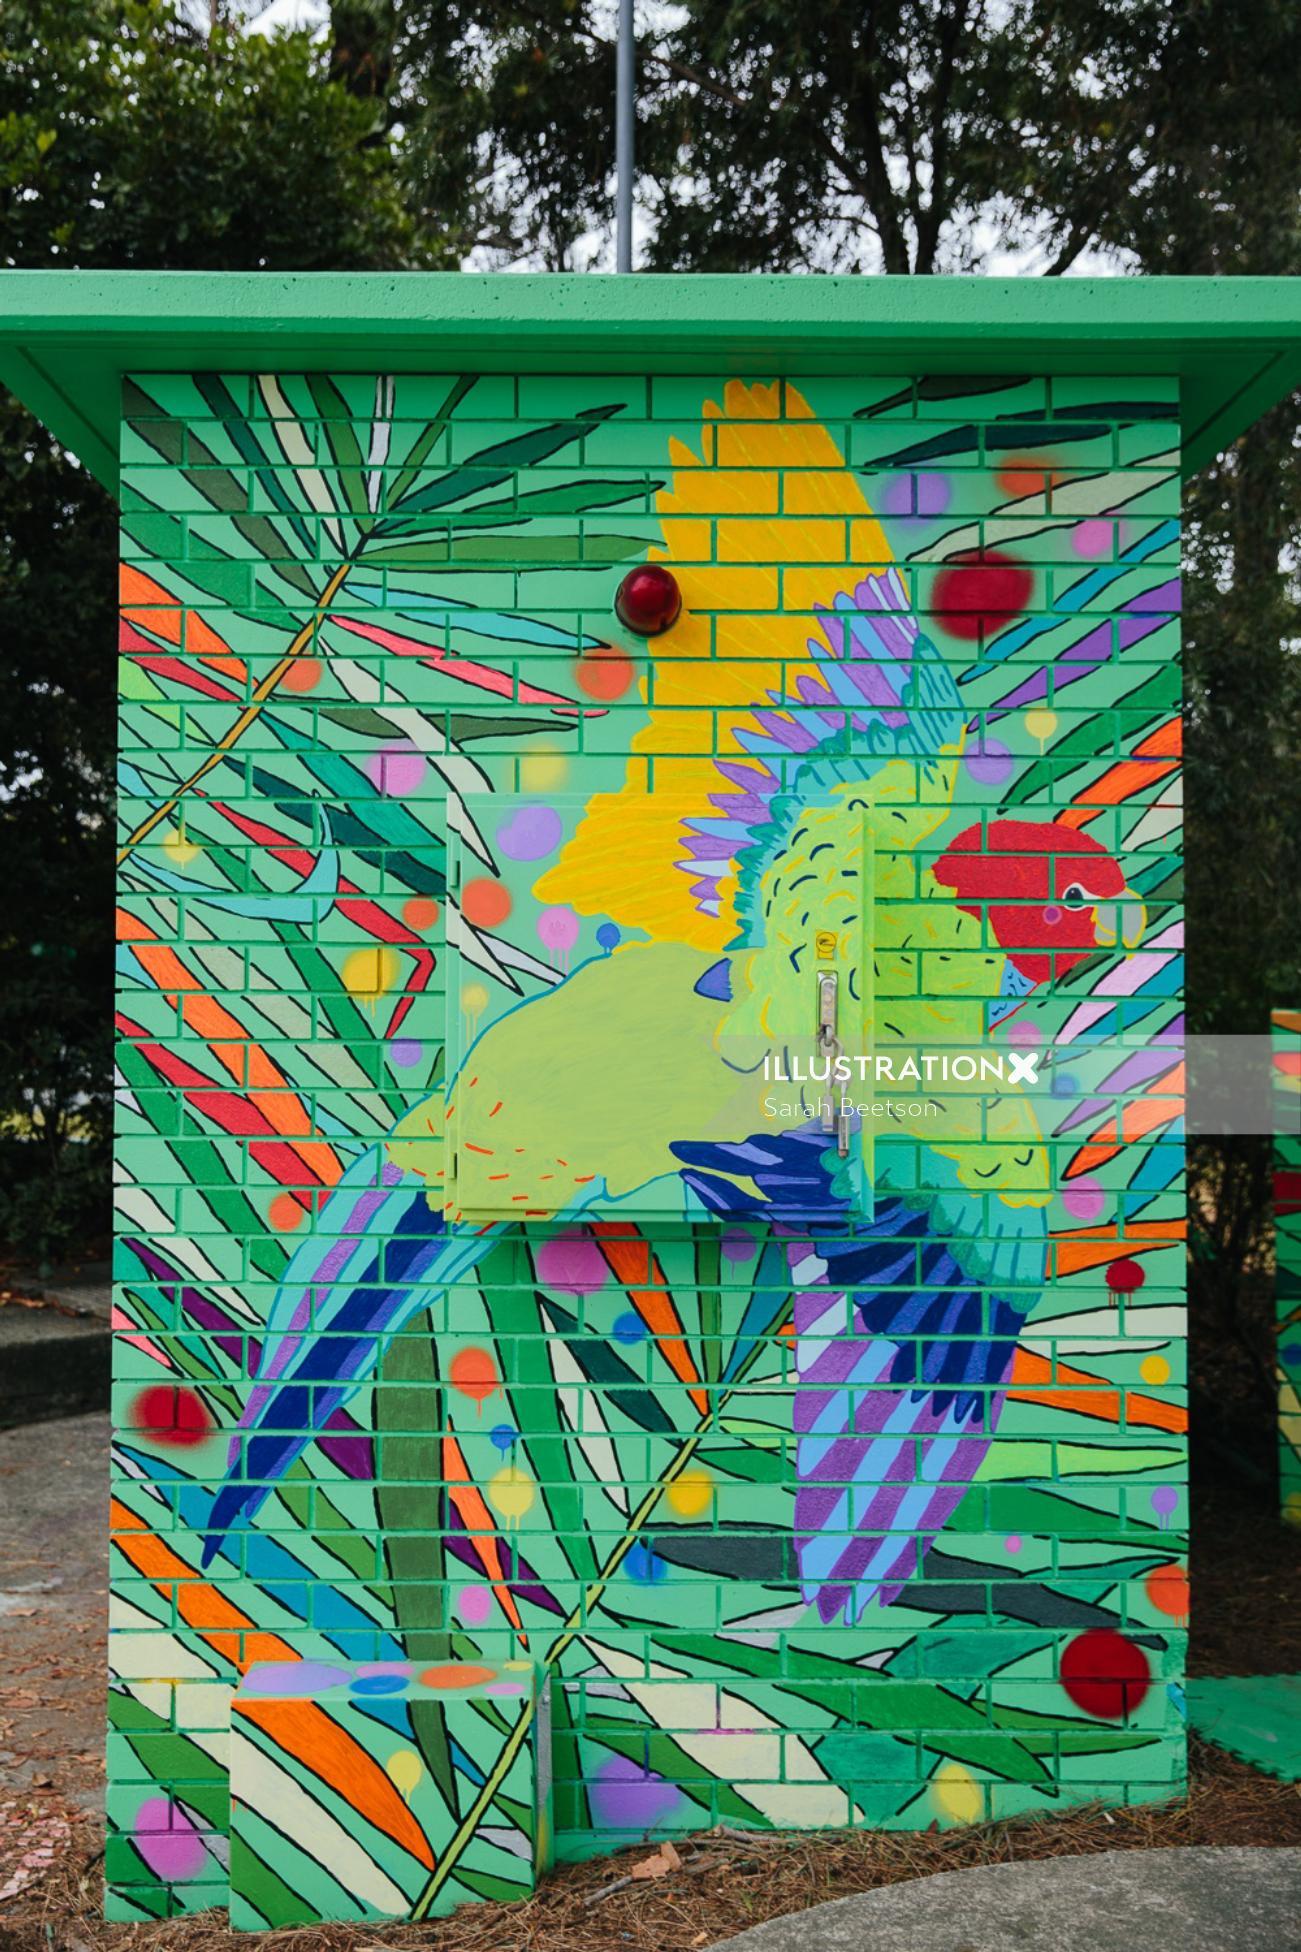 Illustration of parrot wall mural